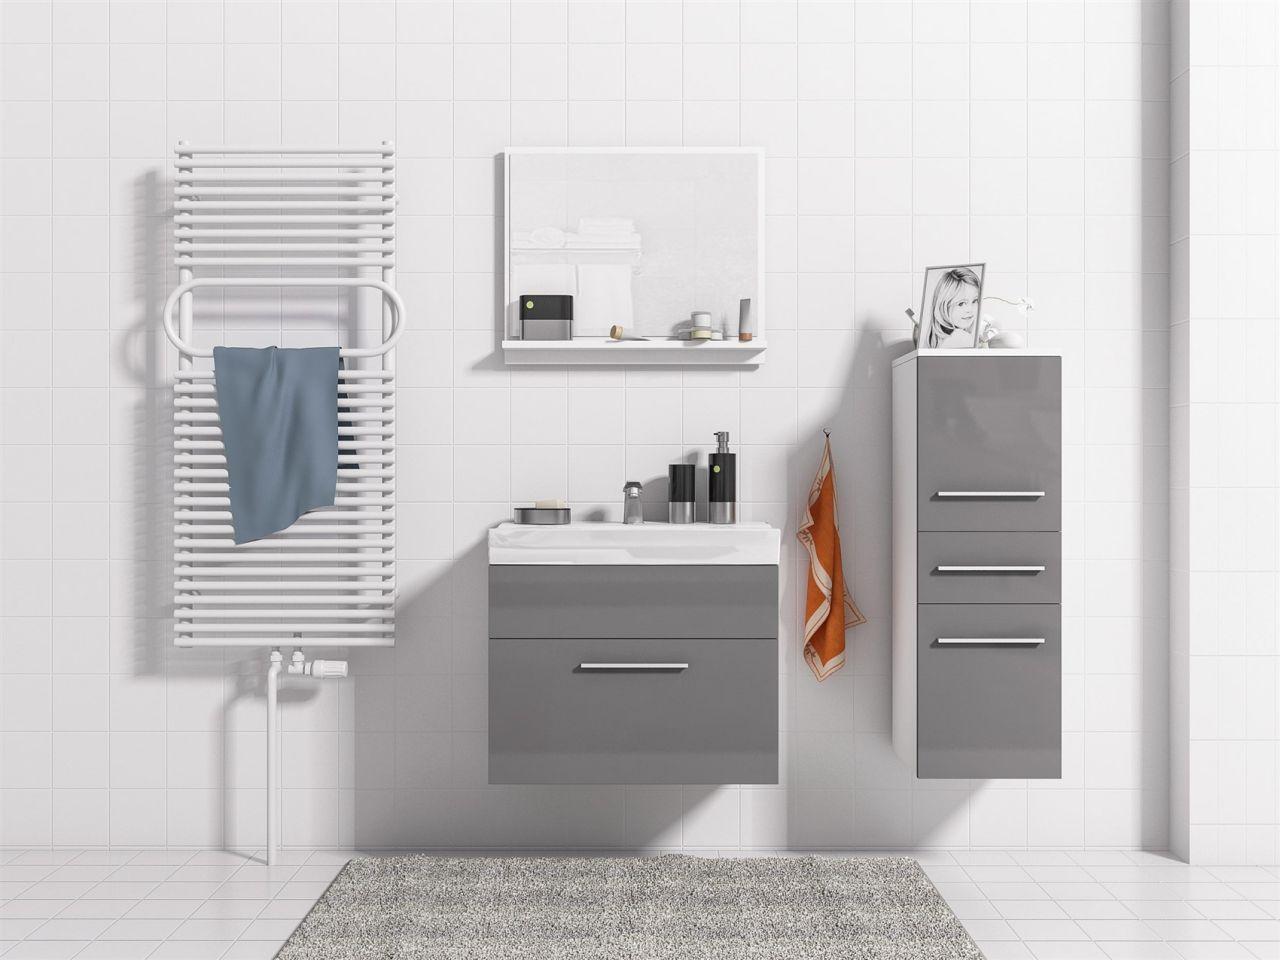 Badmöbel Set Weiß Grau